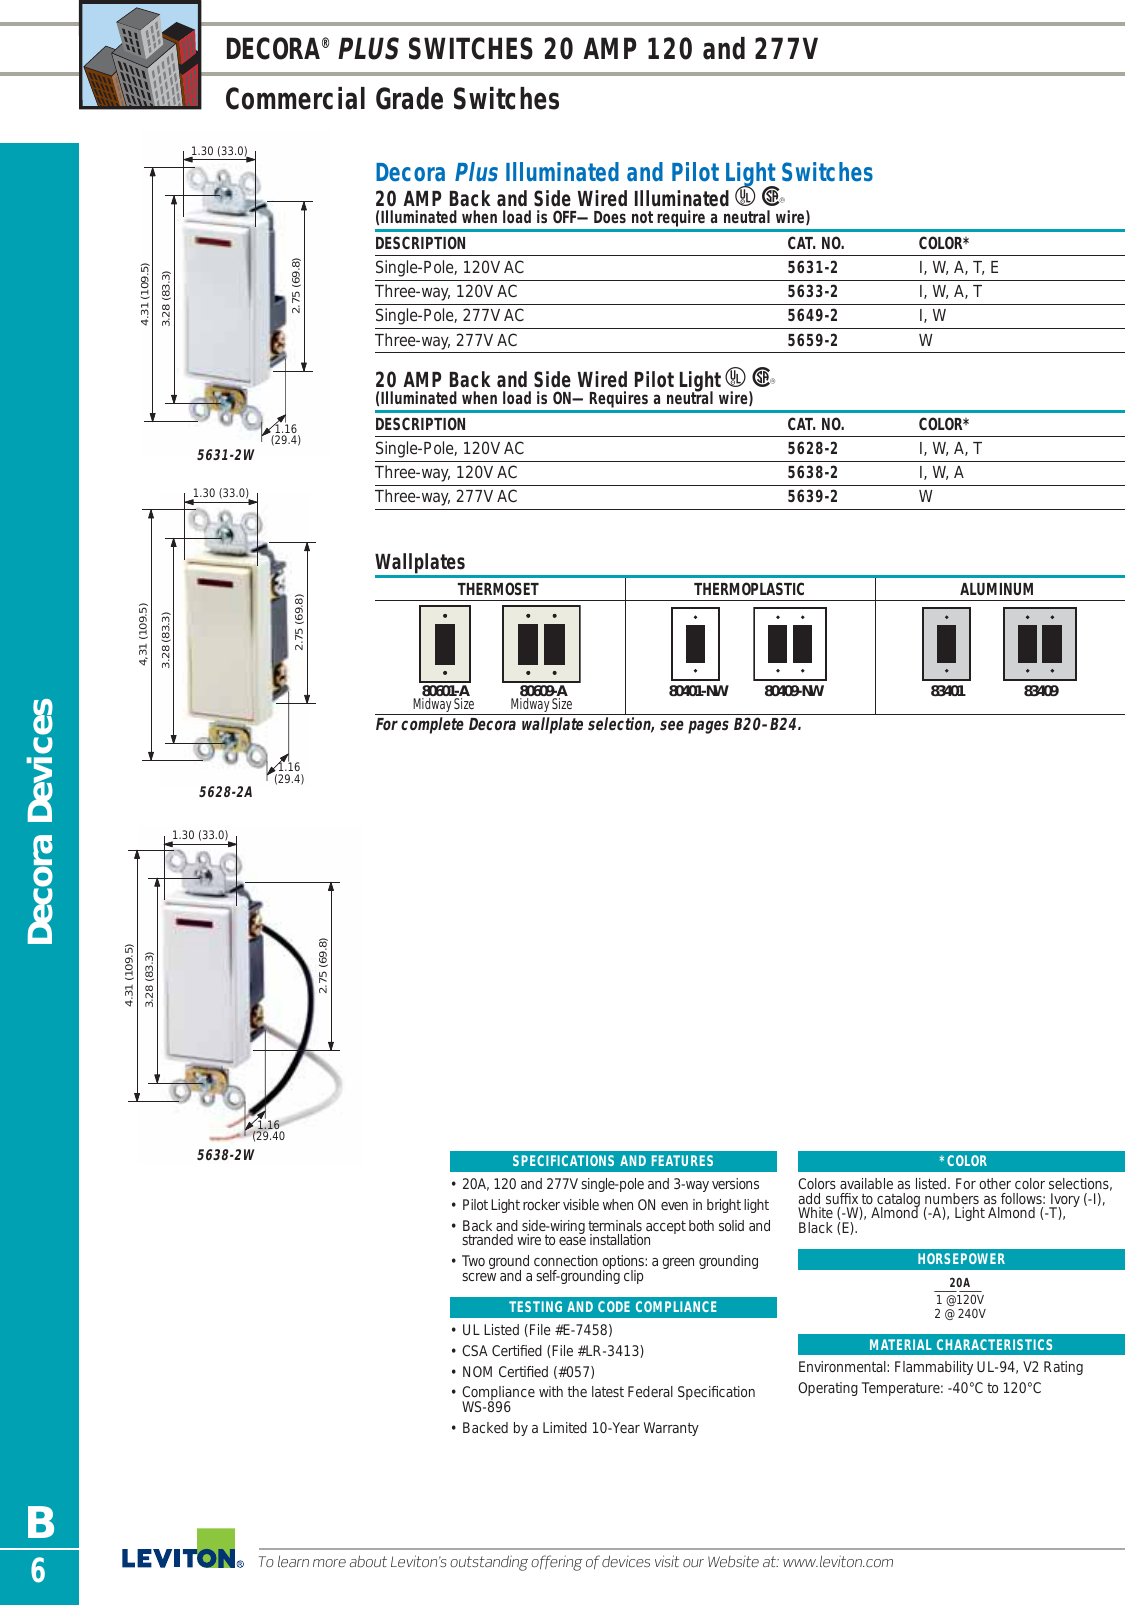 wiring 240v bas fy 1165  wiring diagram for 20 220 volt plug moreover steelcase  wiring diagram for 20 220 volt plug